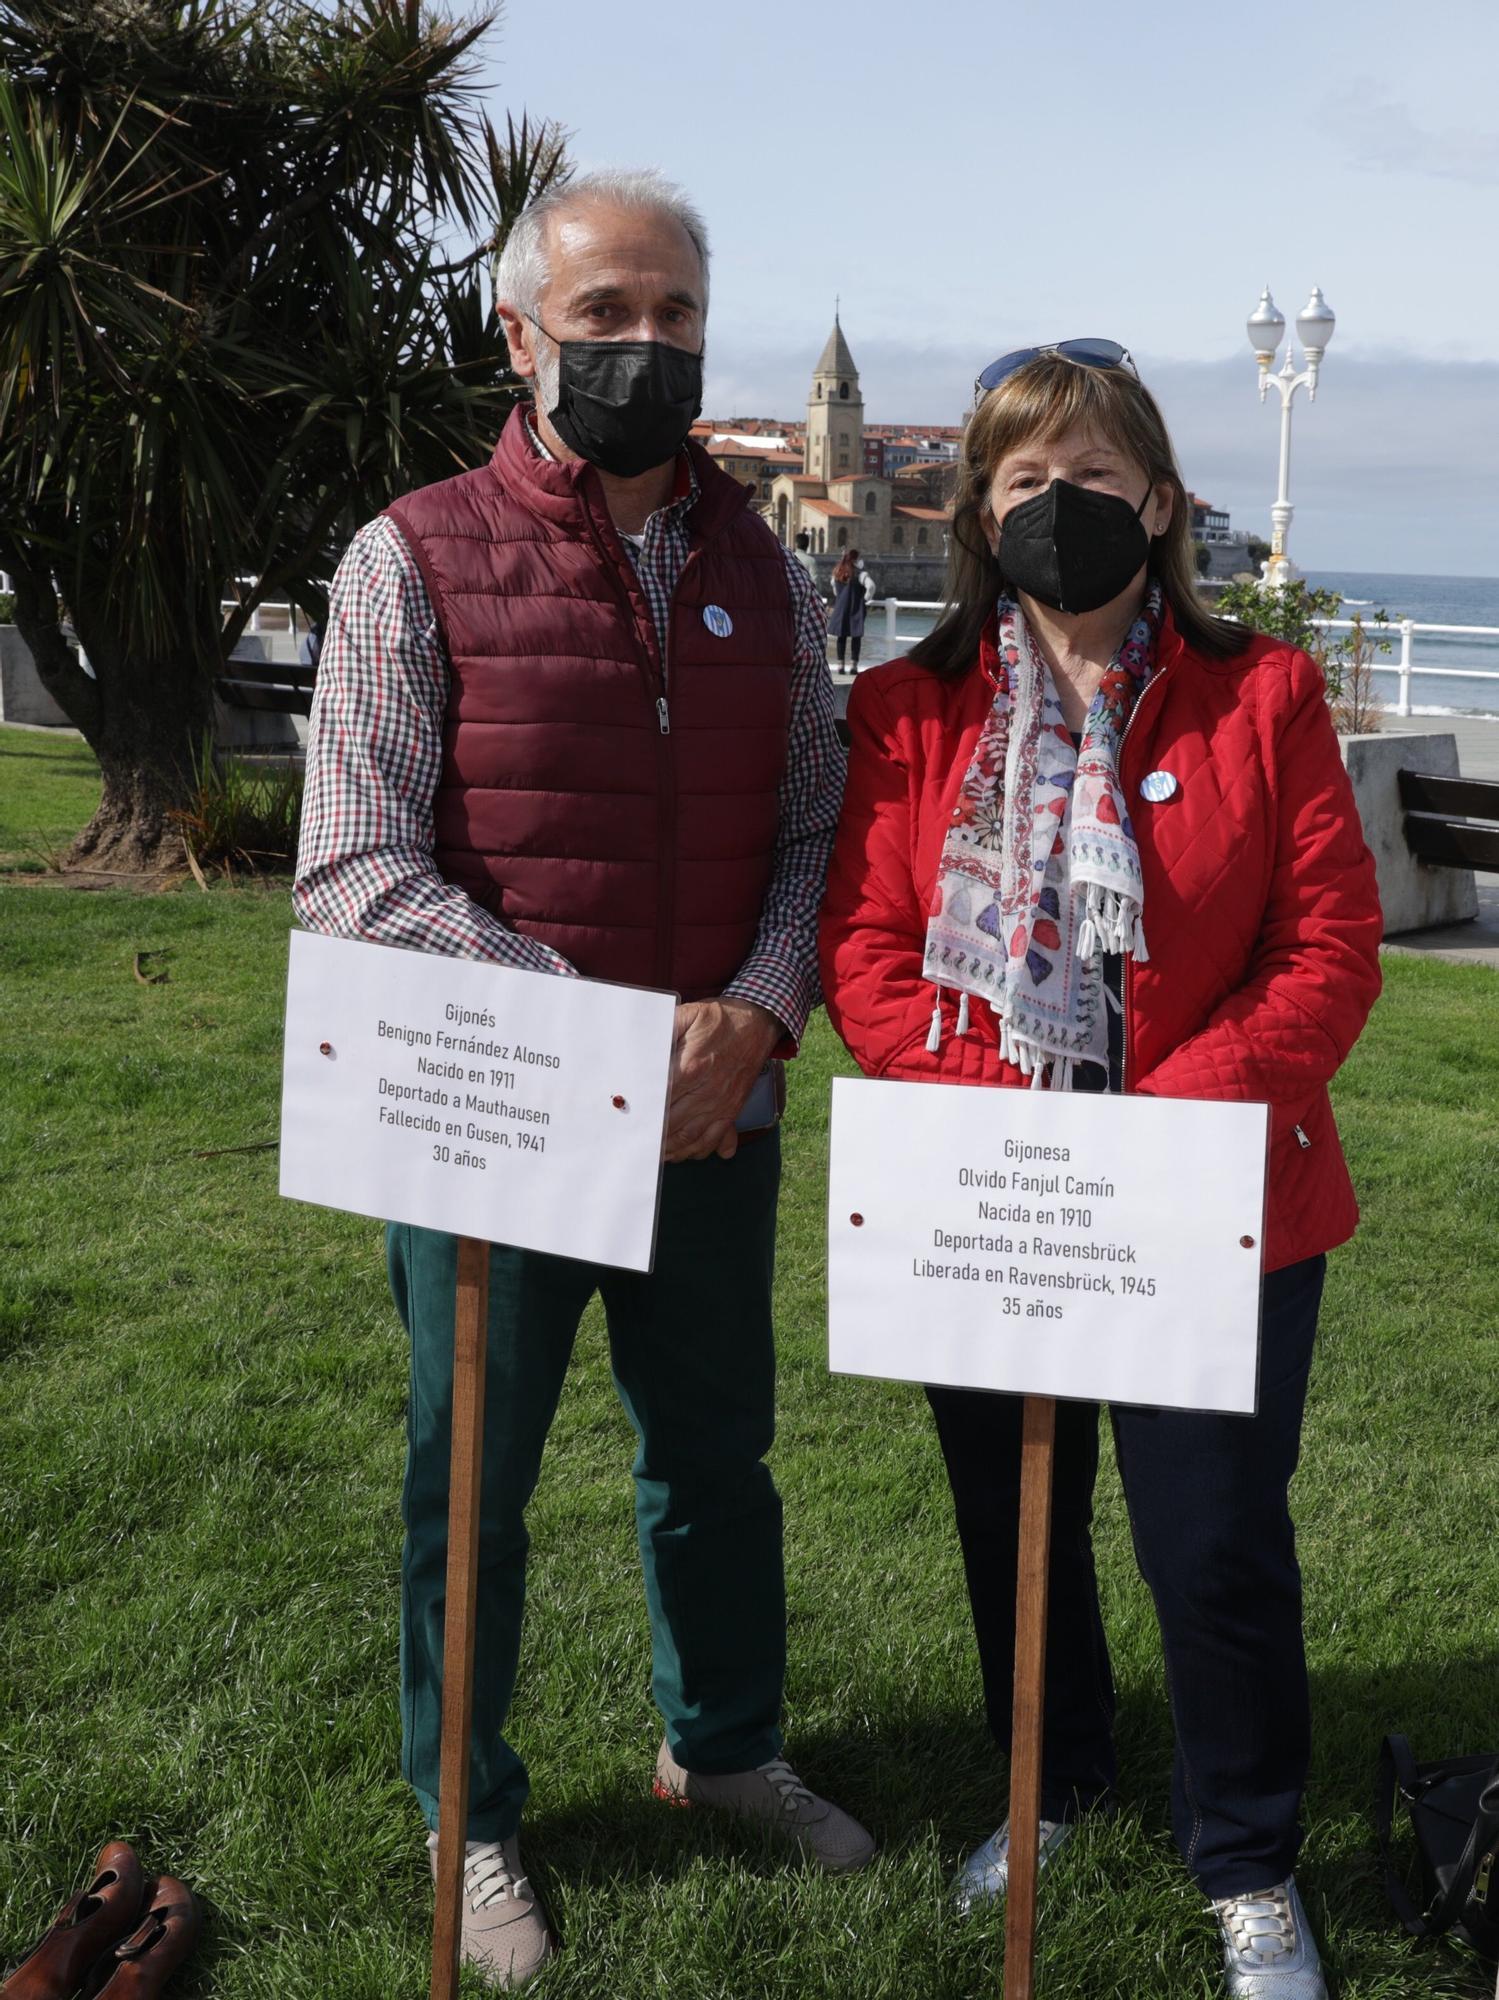 Homenaje a las víctimas de nazismo en Gijón